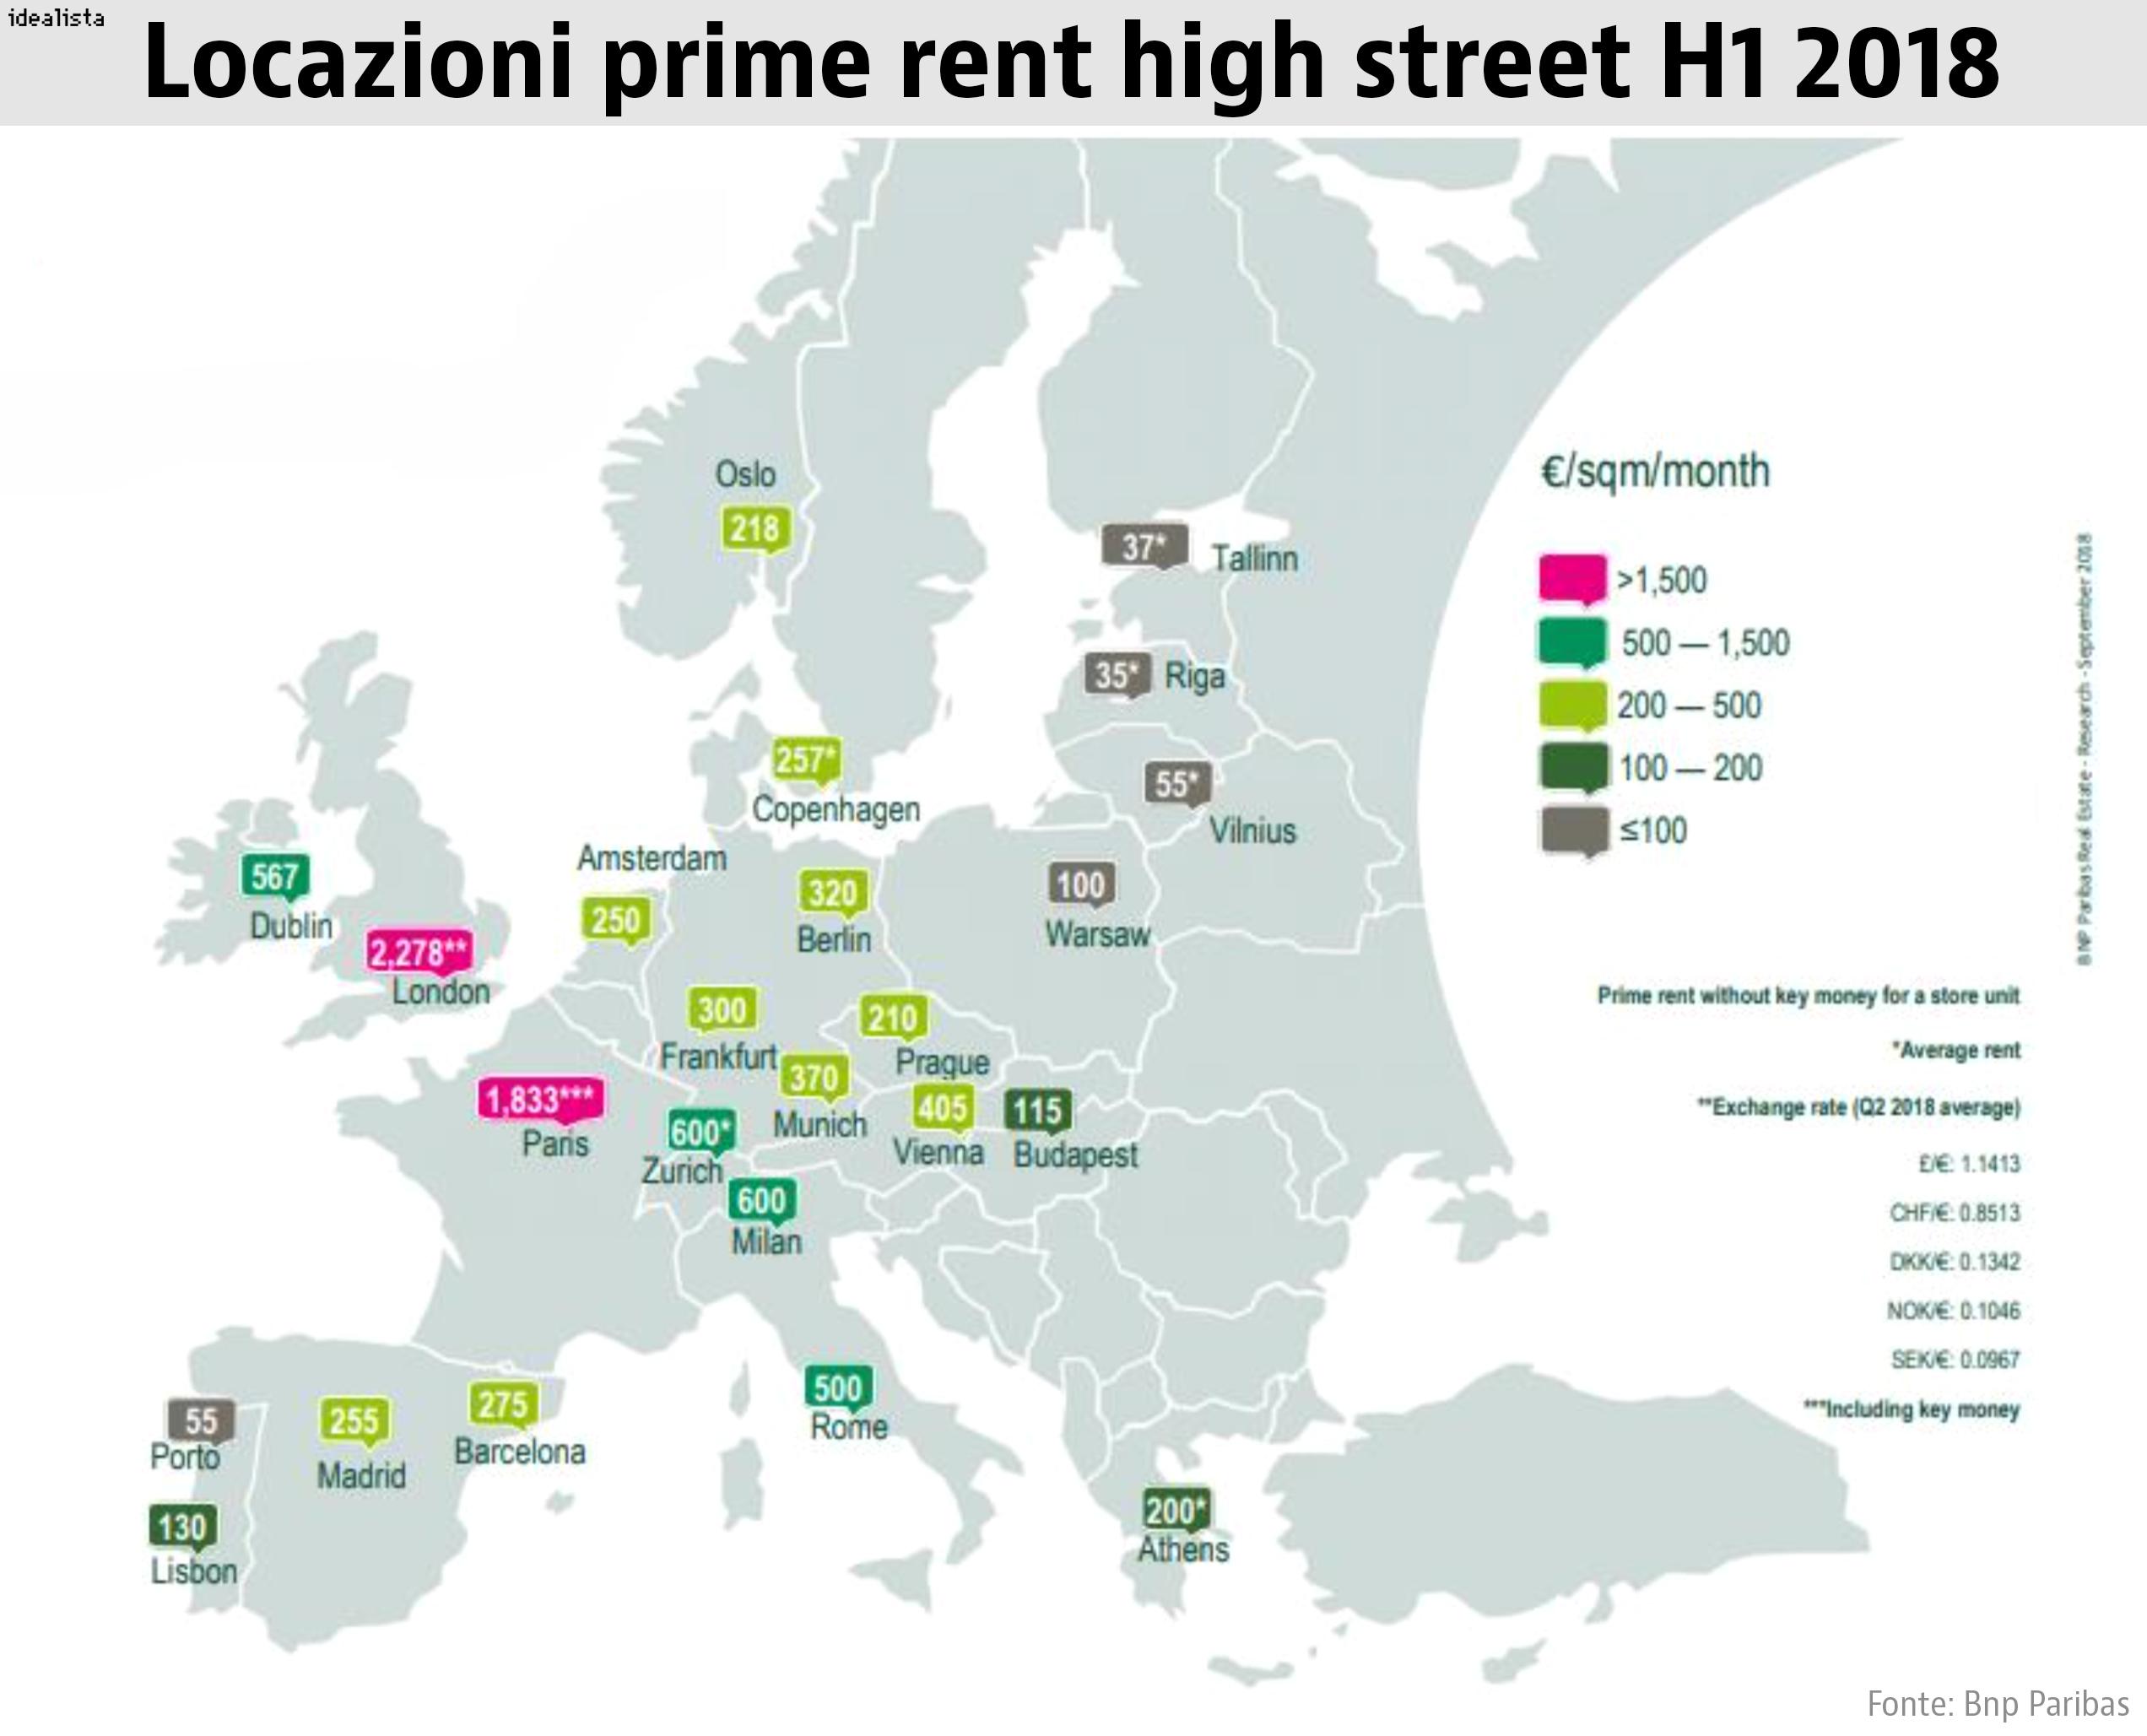 prime rent high street